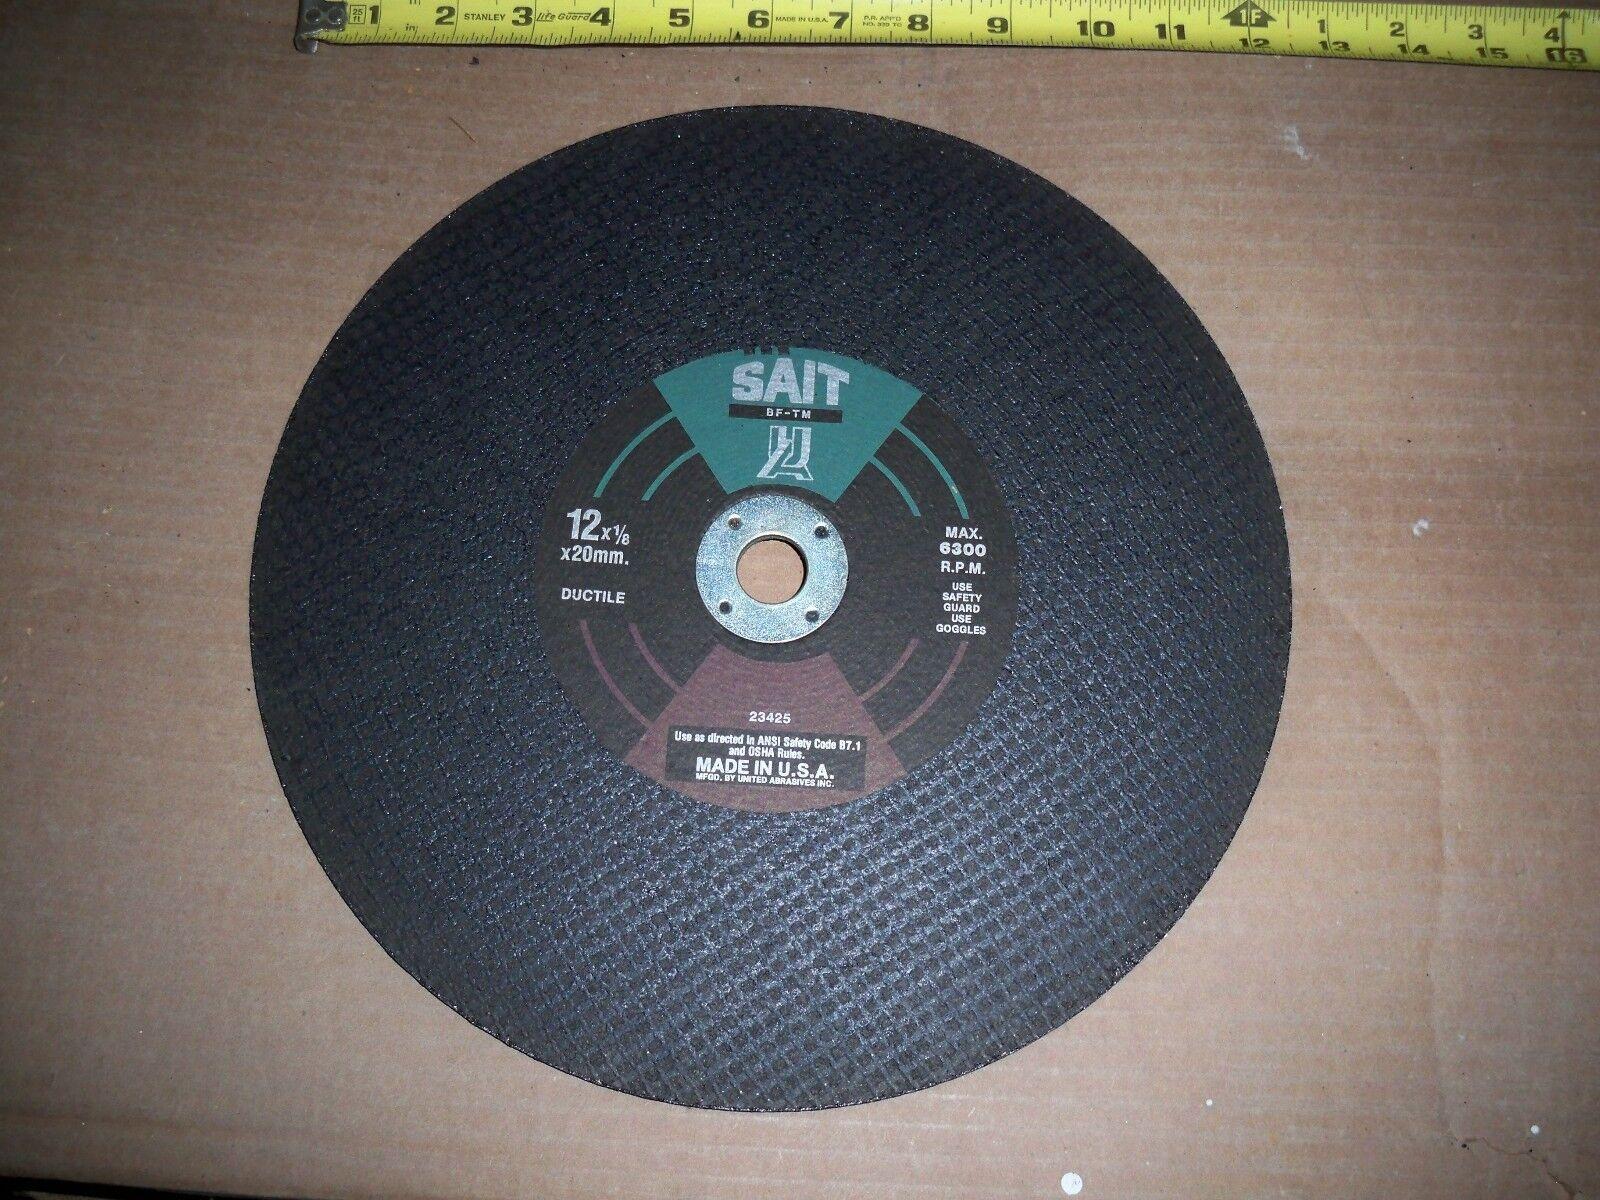 8pc-12 X1 8 X 1 SAIT REINFORCED FOR DUCTILE CUT-OFF WHEEL BLADE ABRASIVE CUTOFF